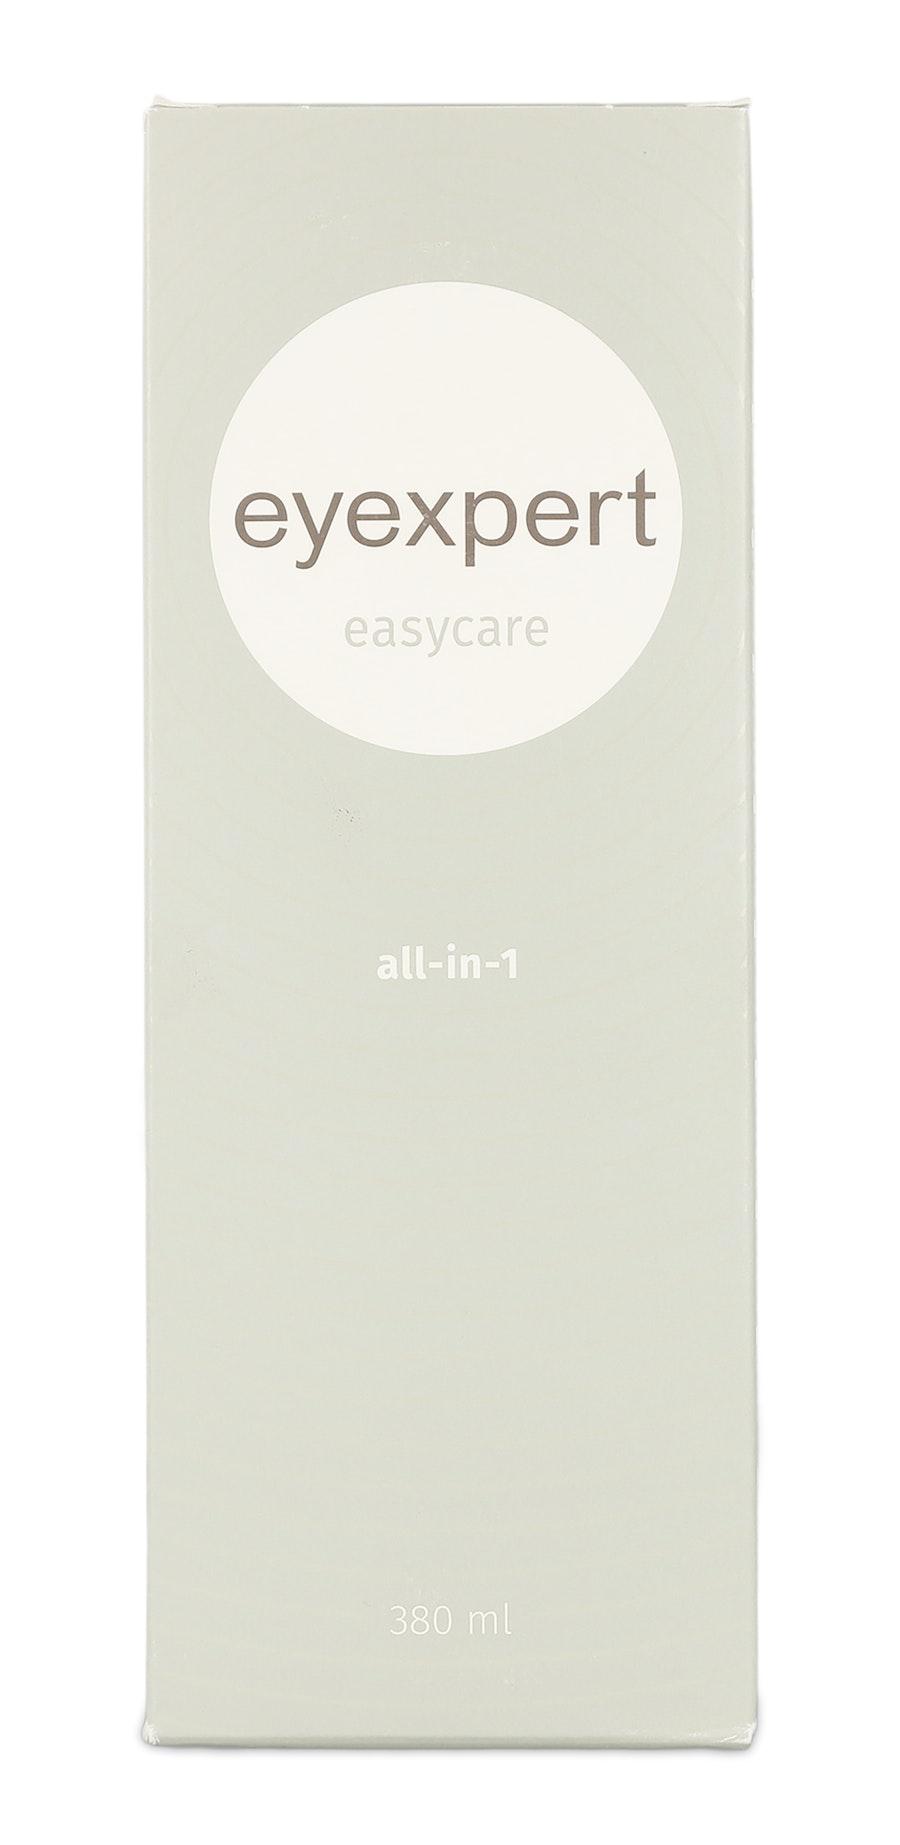 Eyexpert Easycare All-in-1 380ml